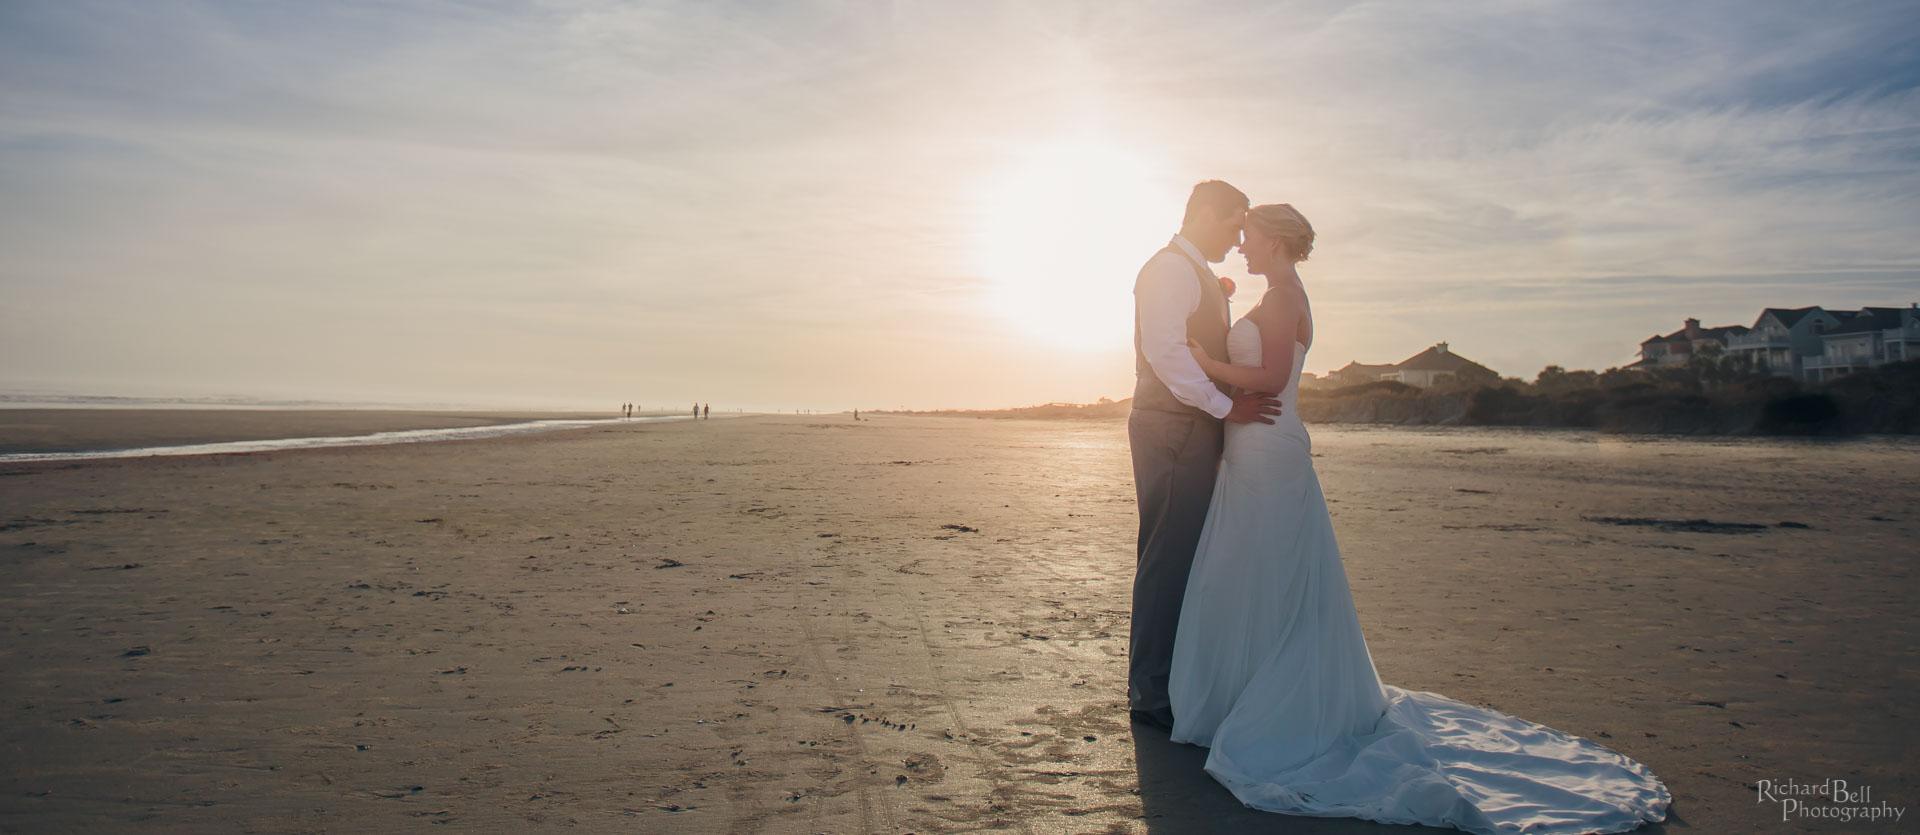 Bride and Groom on beach of Wild Dunes